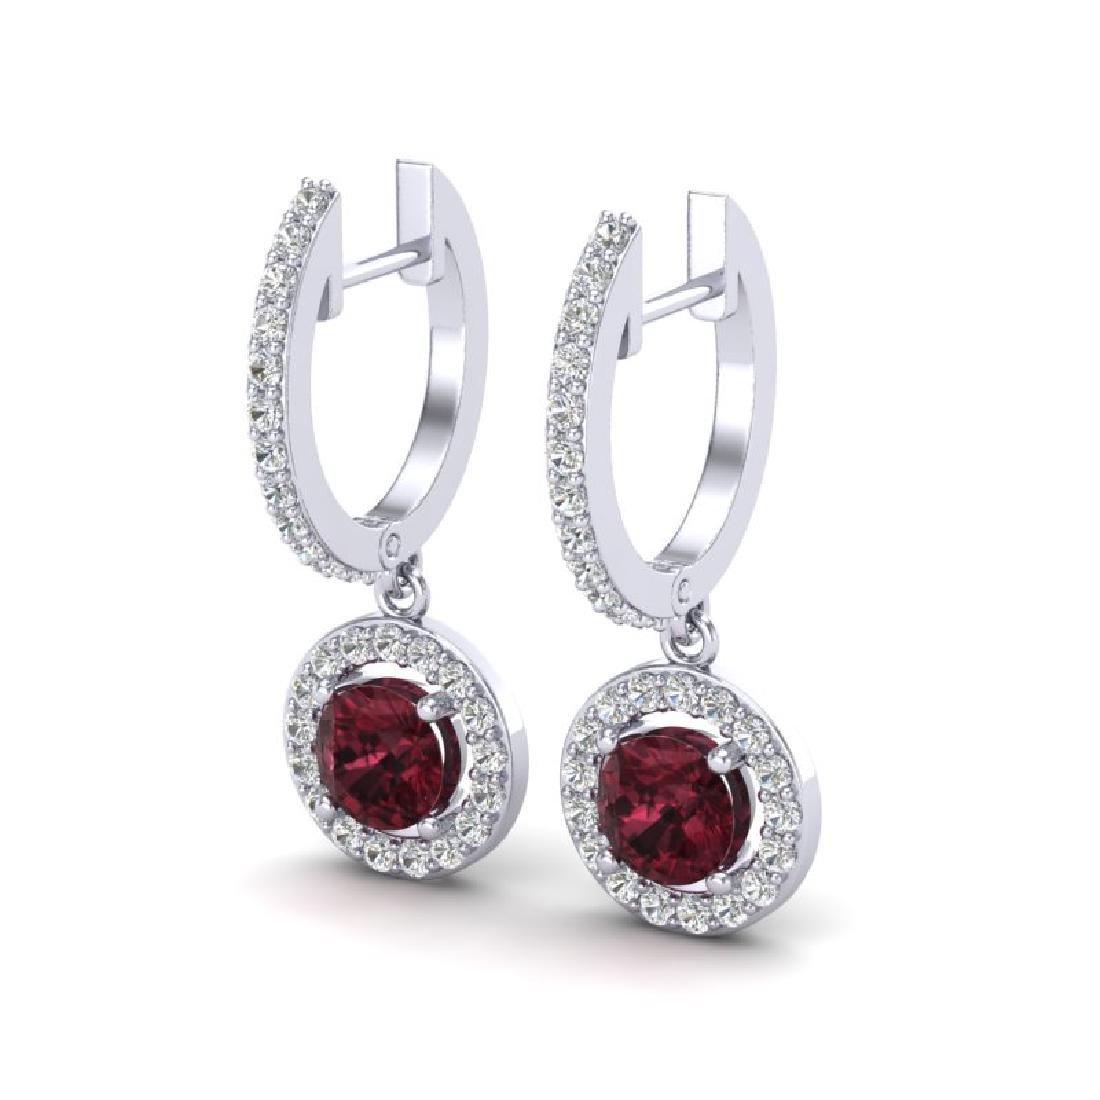 1.75 CTW Garnet & Micro Halo VS/SI Diamond Earrings 18K